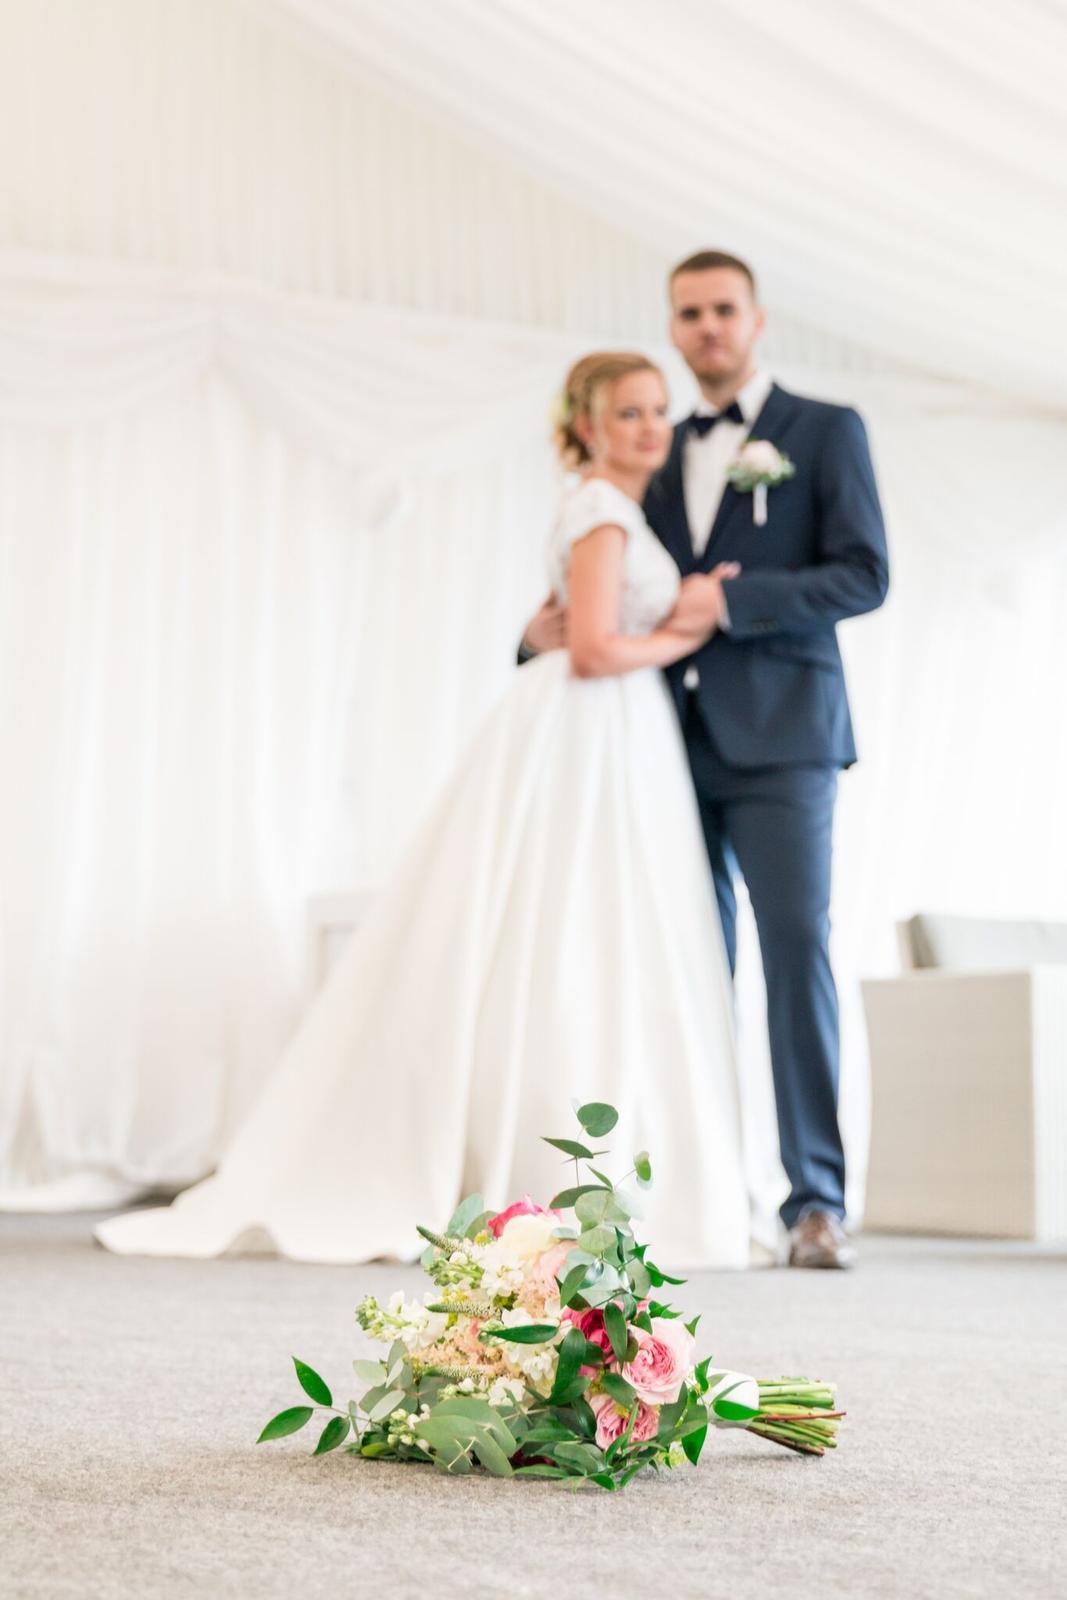 Septembrová svadba - Obrázok č. 3